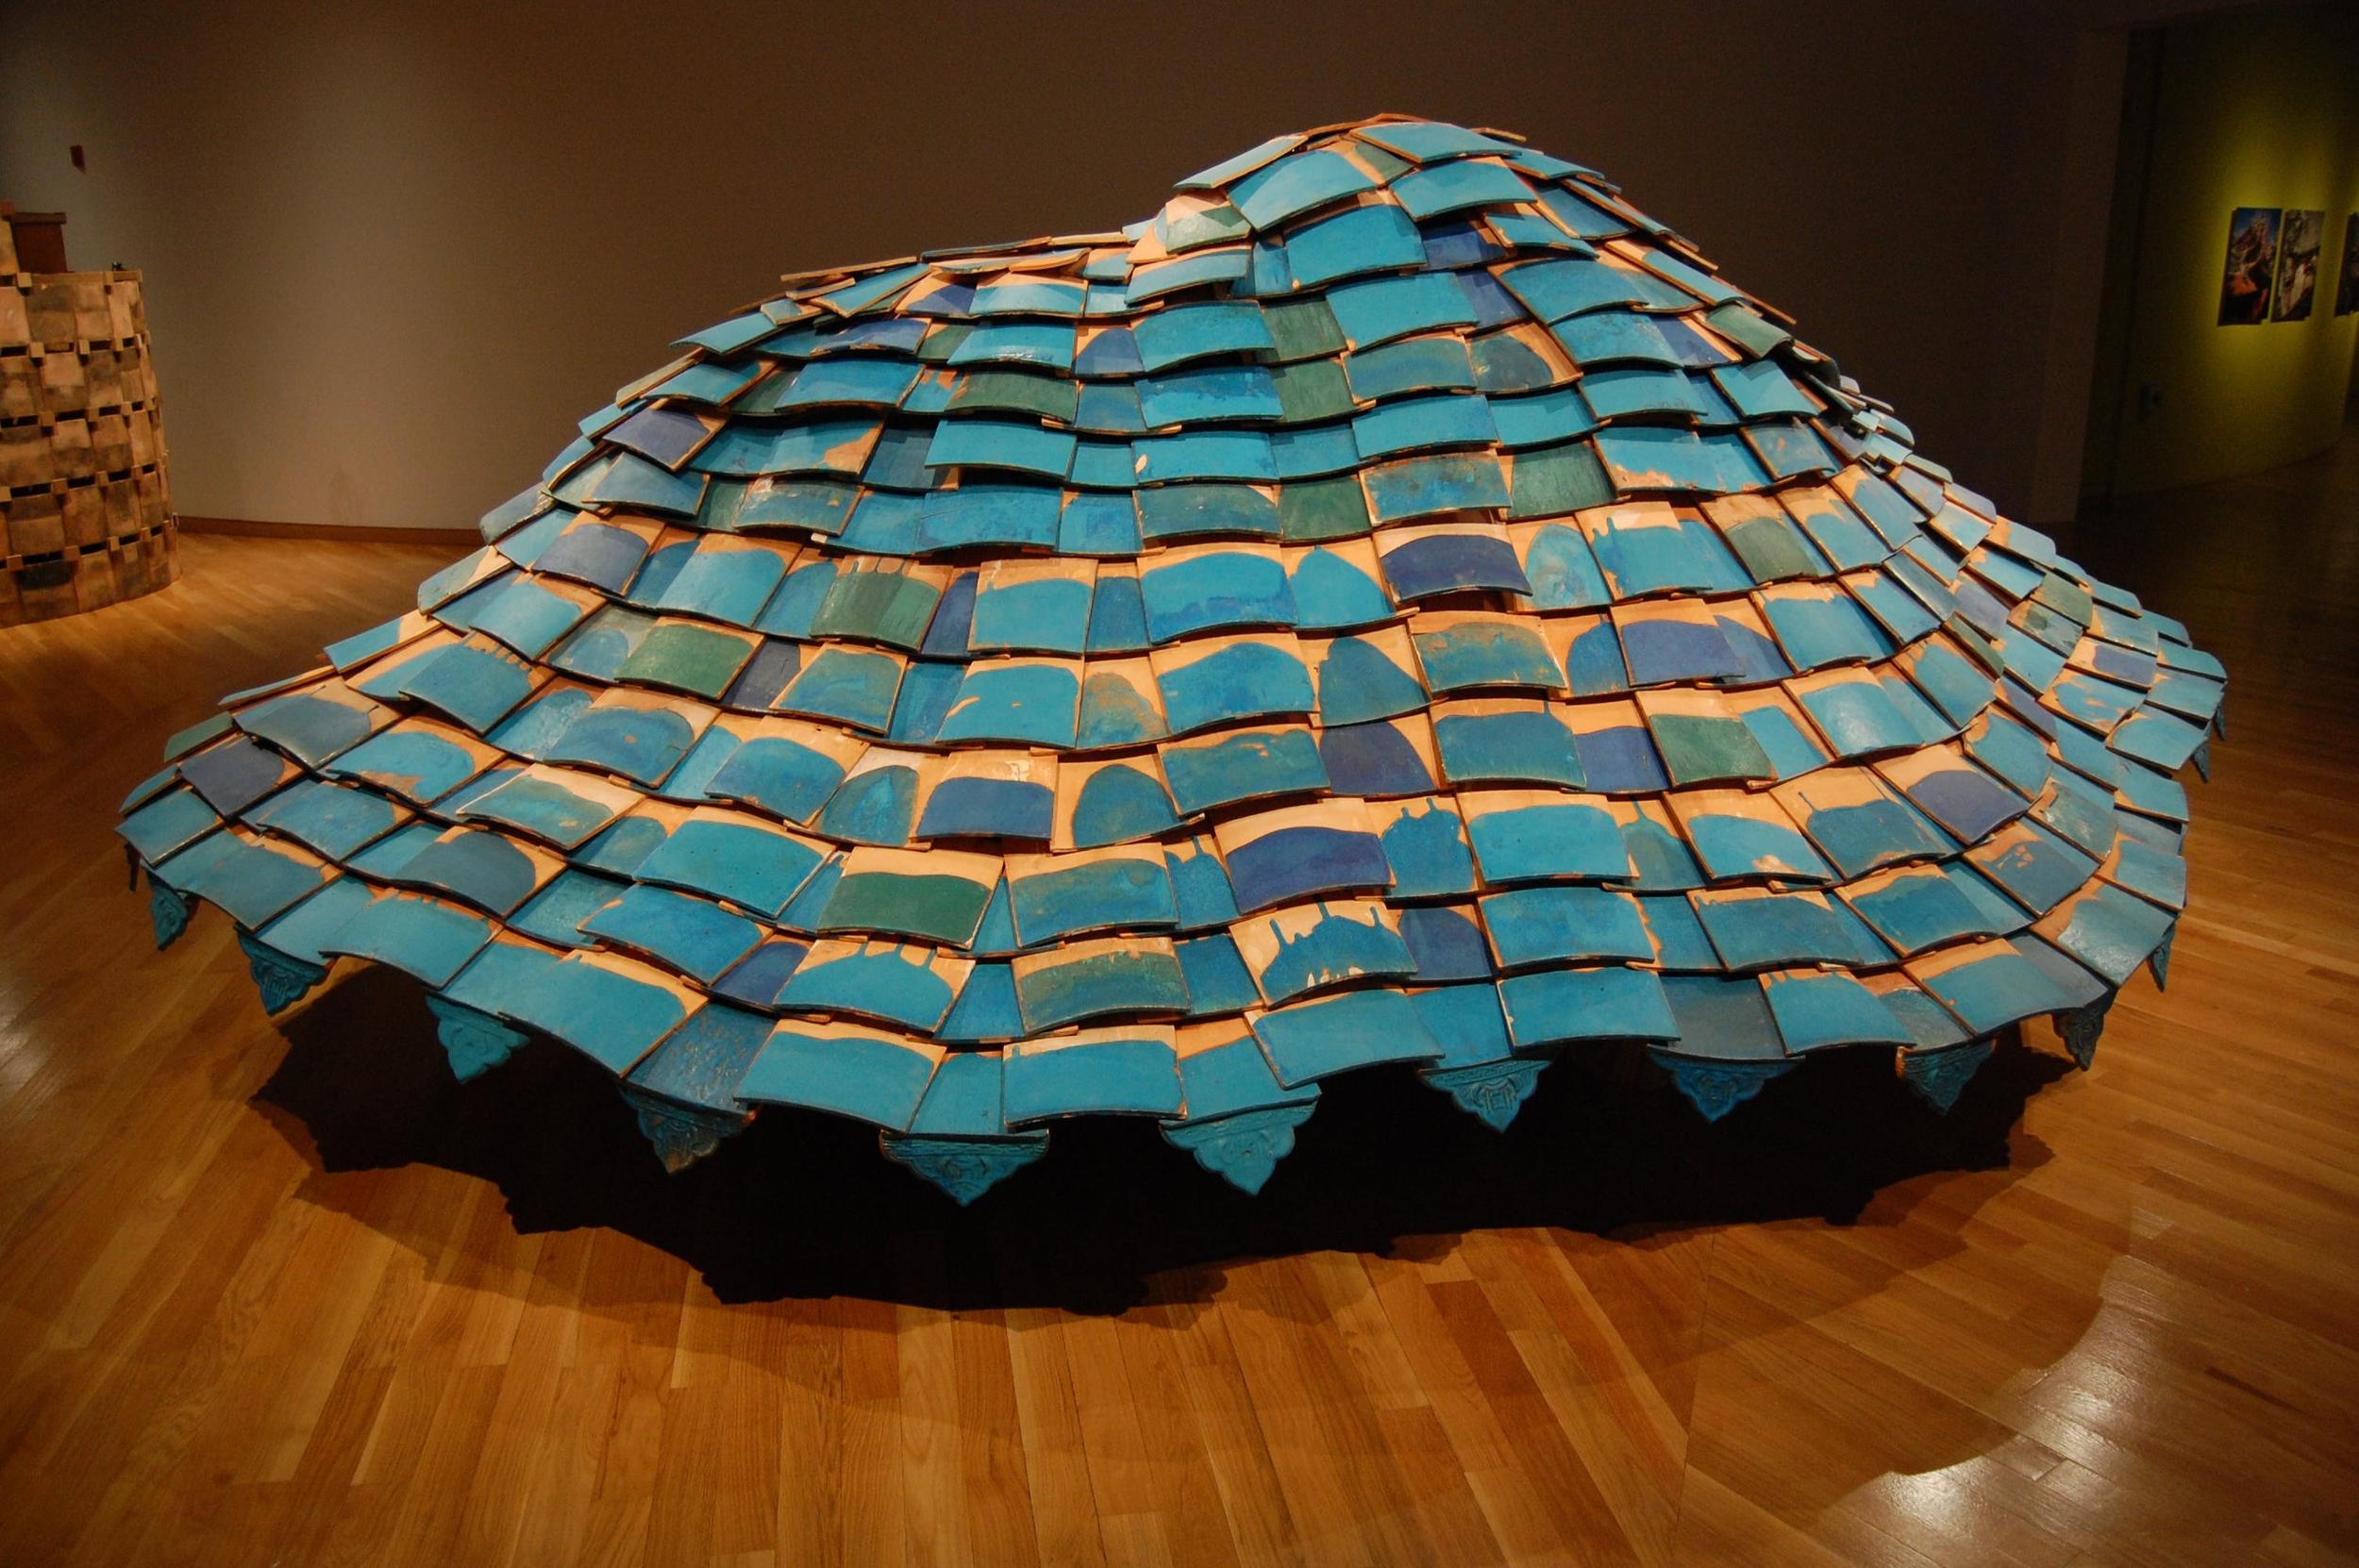 "Tom Lauerman & Shannon Goff, Hovercraft, Ceramic & wood, 2008, 240"" x 120"" x 74"""